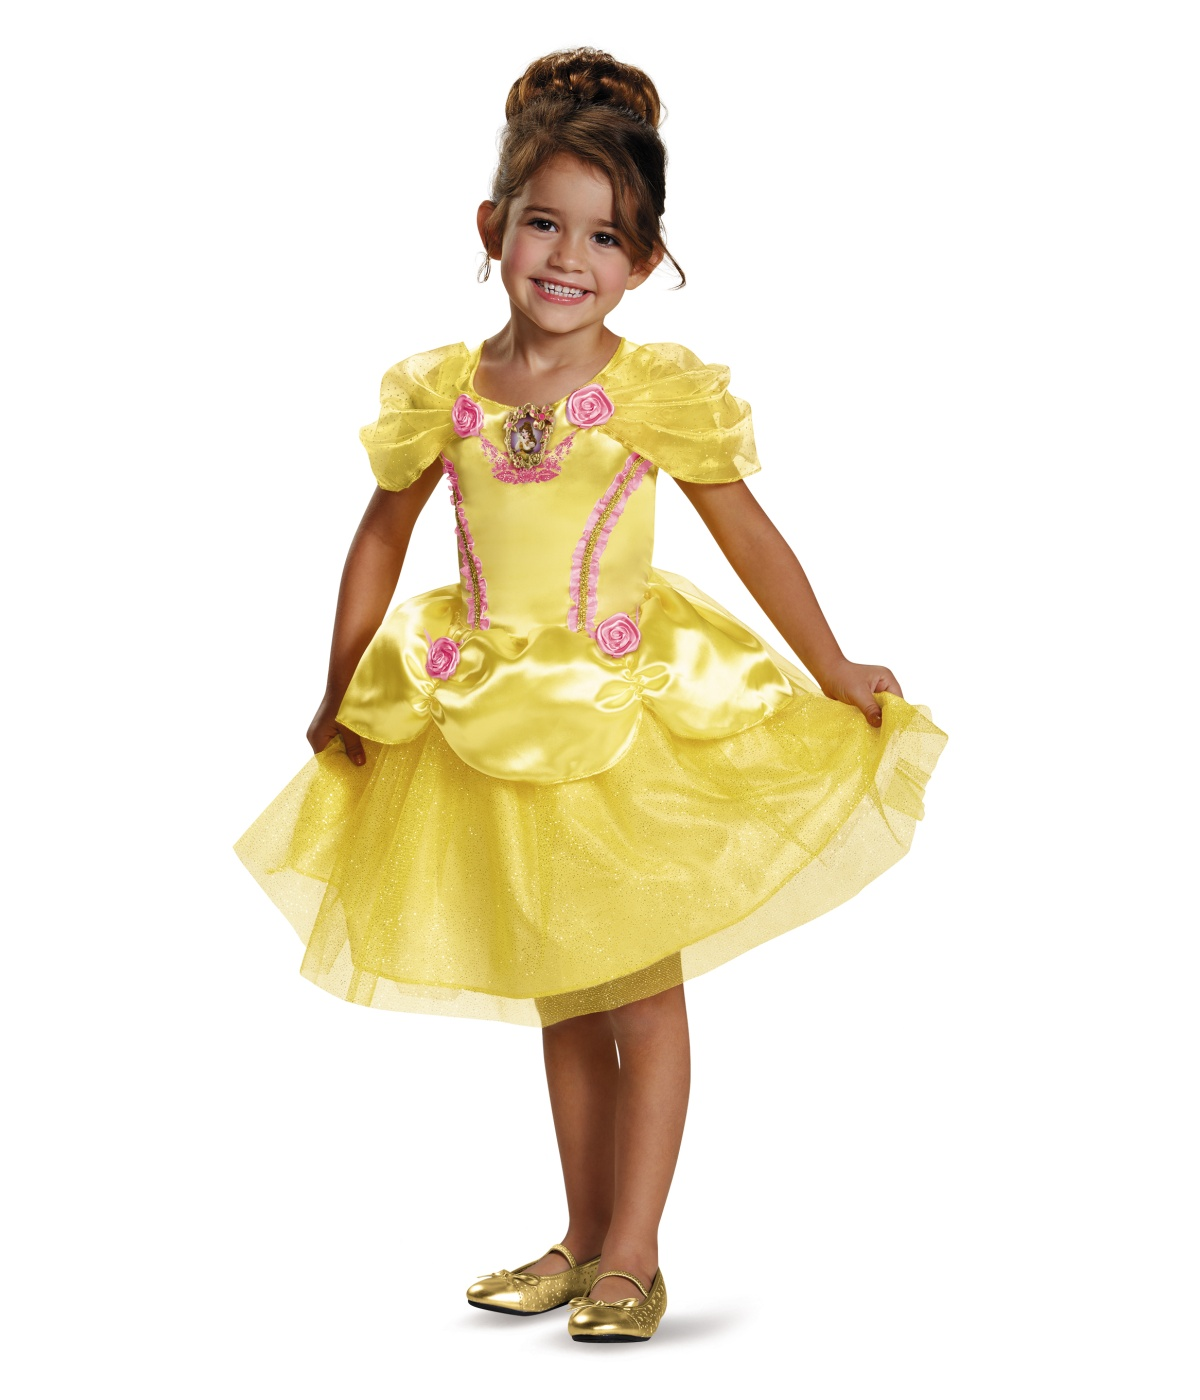 Princess Costumes - Fairy Tale Princess Dresses & Gowns